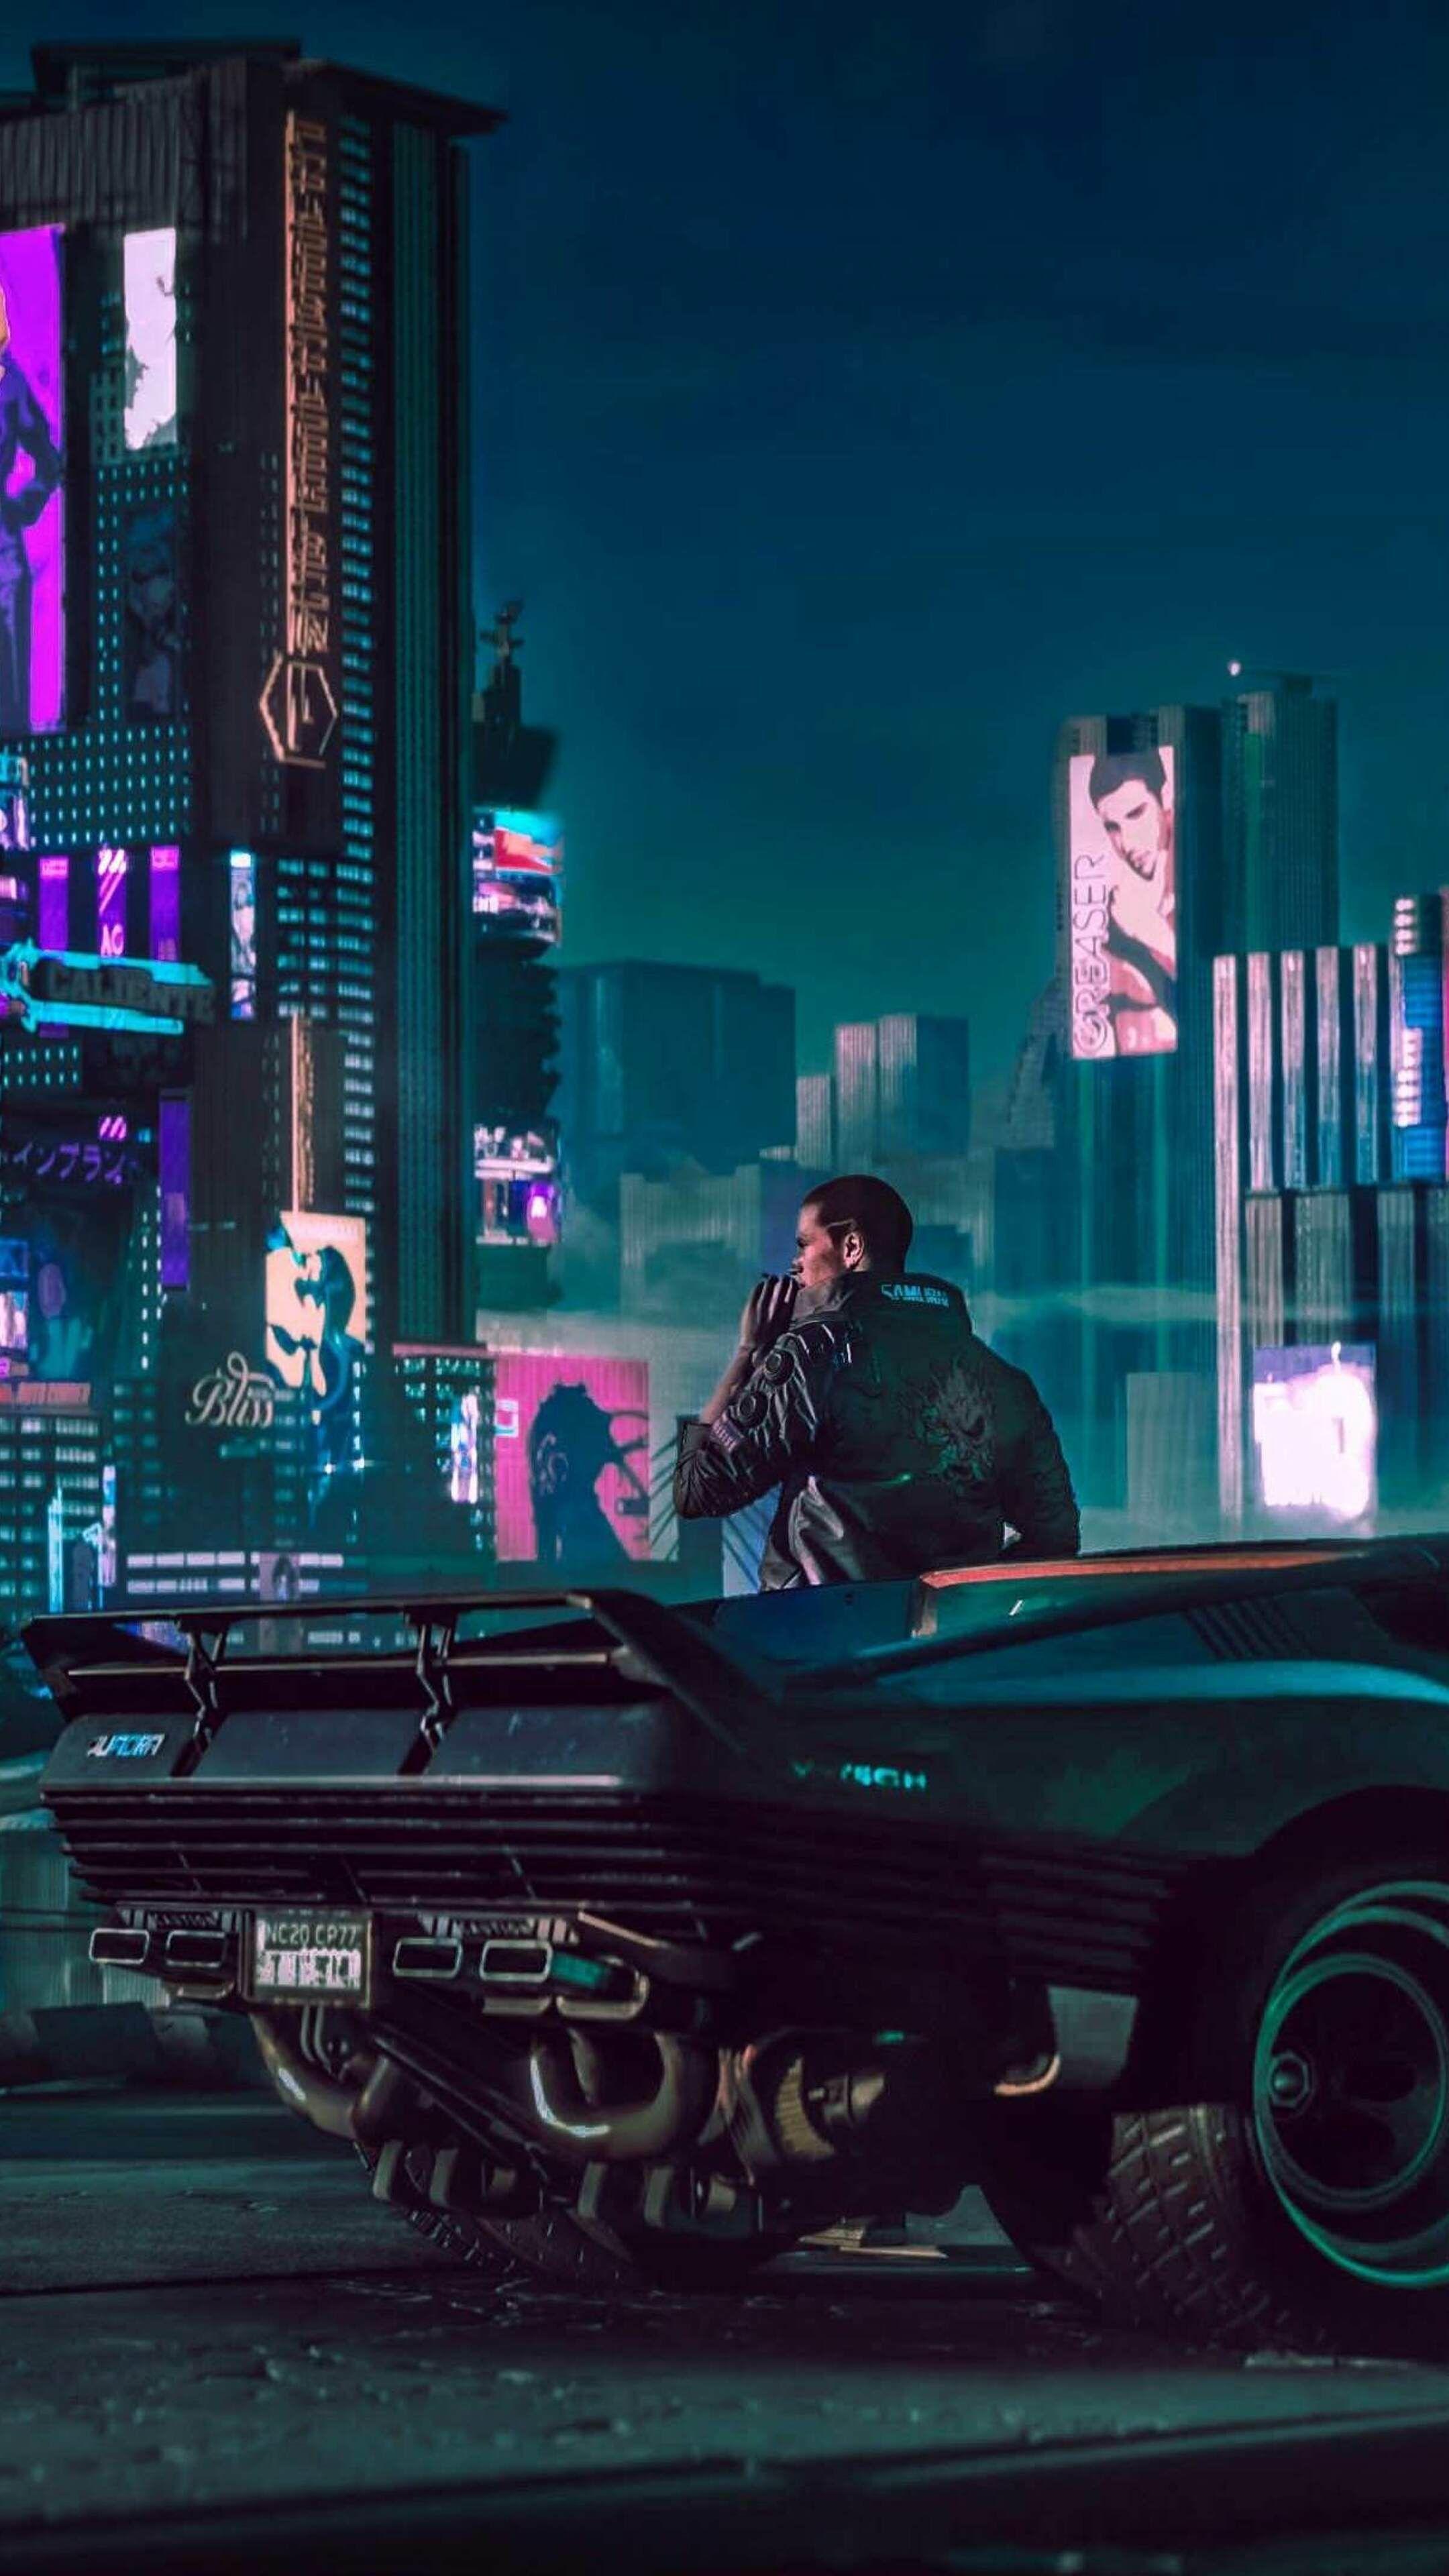 2018 Cyberpunk 2077 4k N6 2160x3840 Cyberpunk 2077 Cyberpunk Cyberpunk Aesthetic